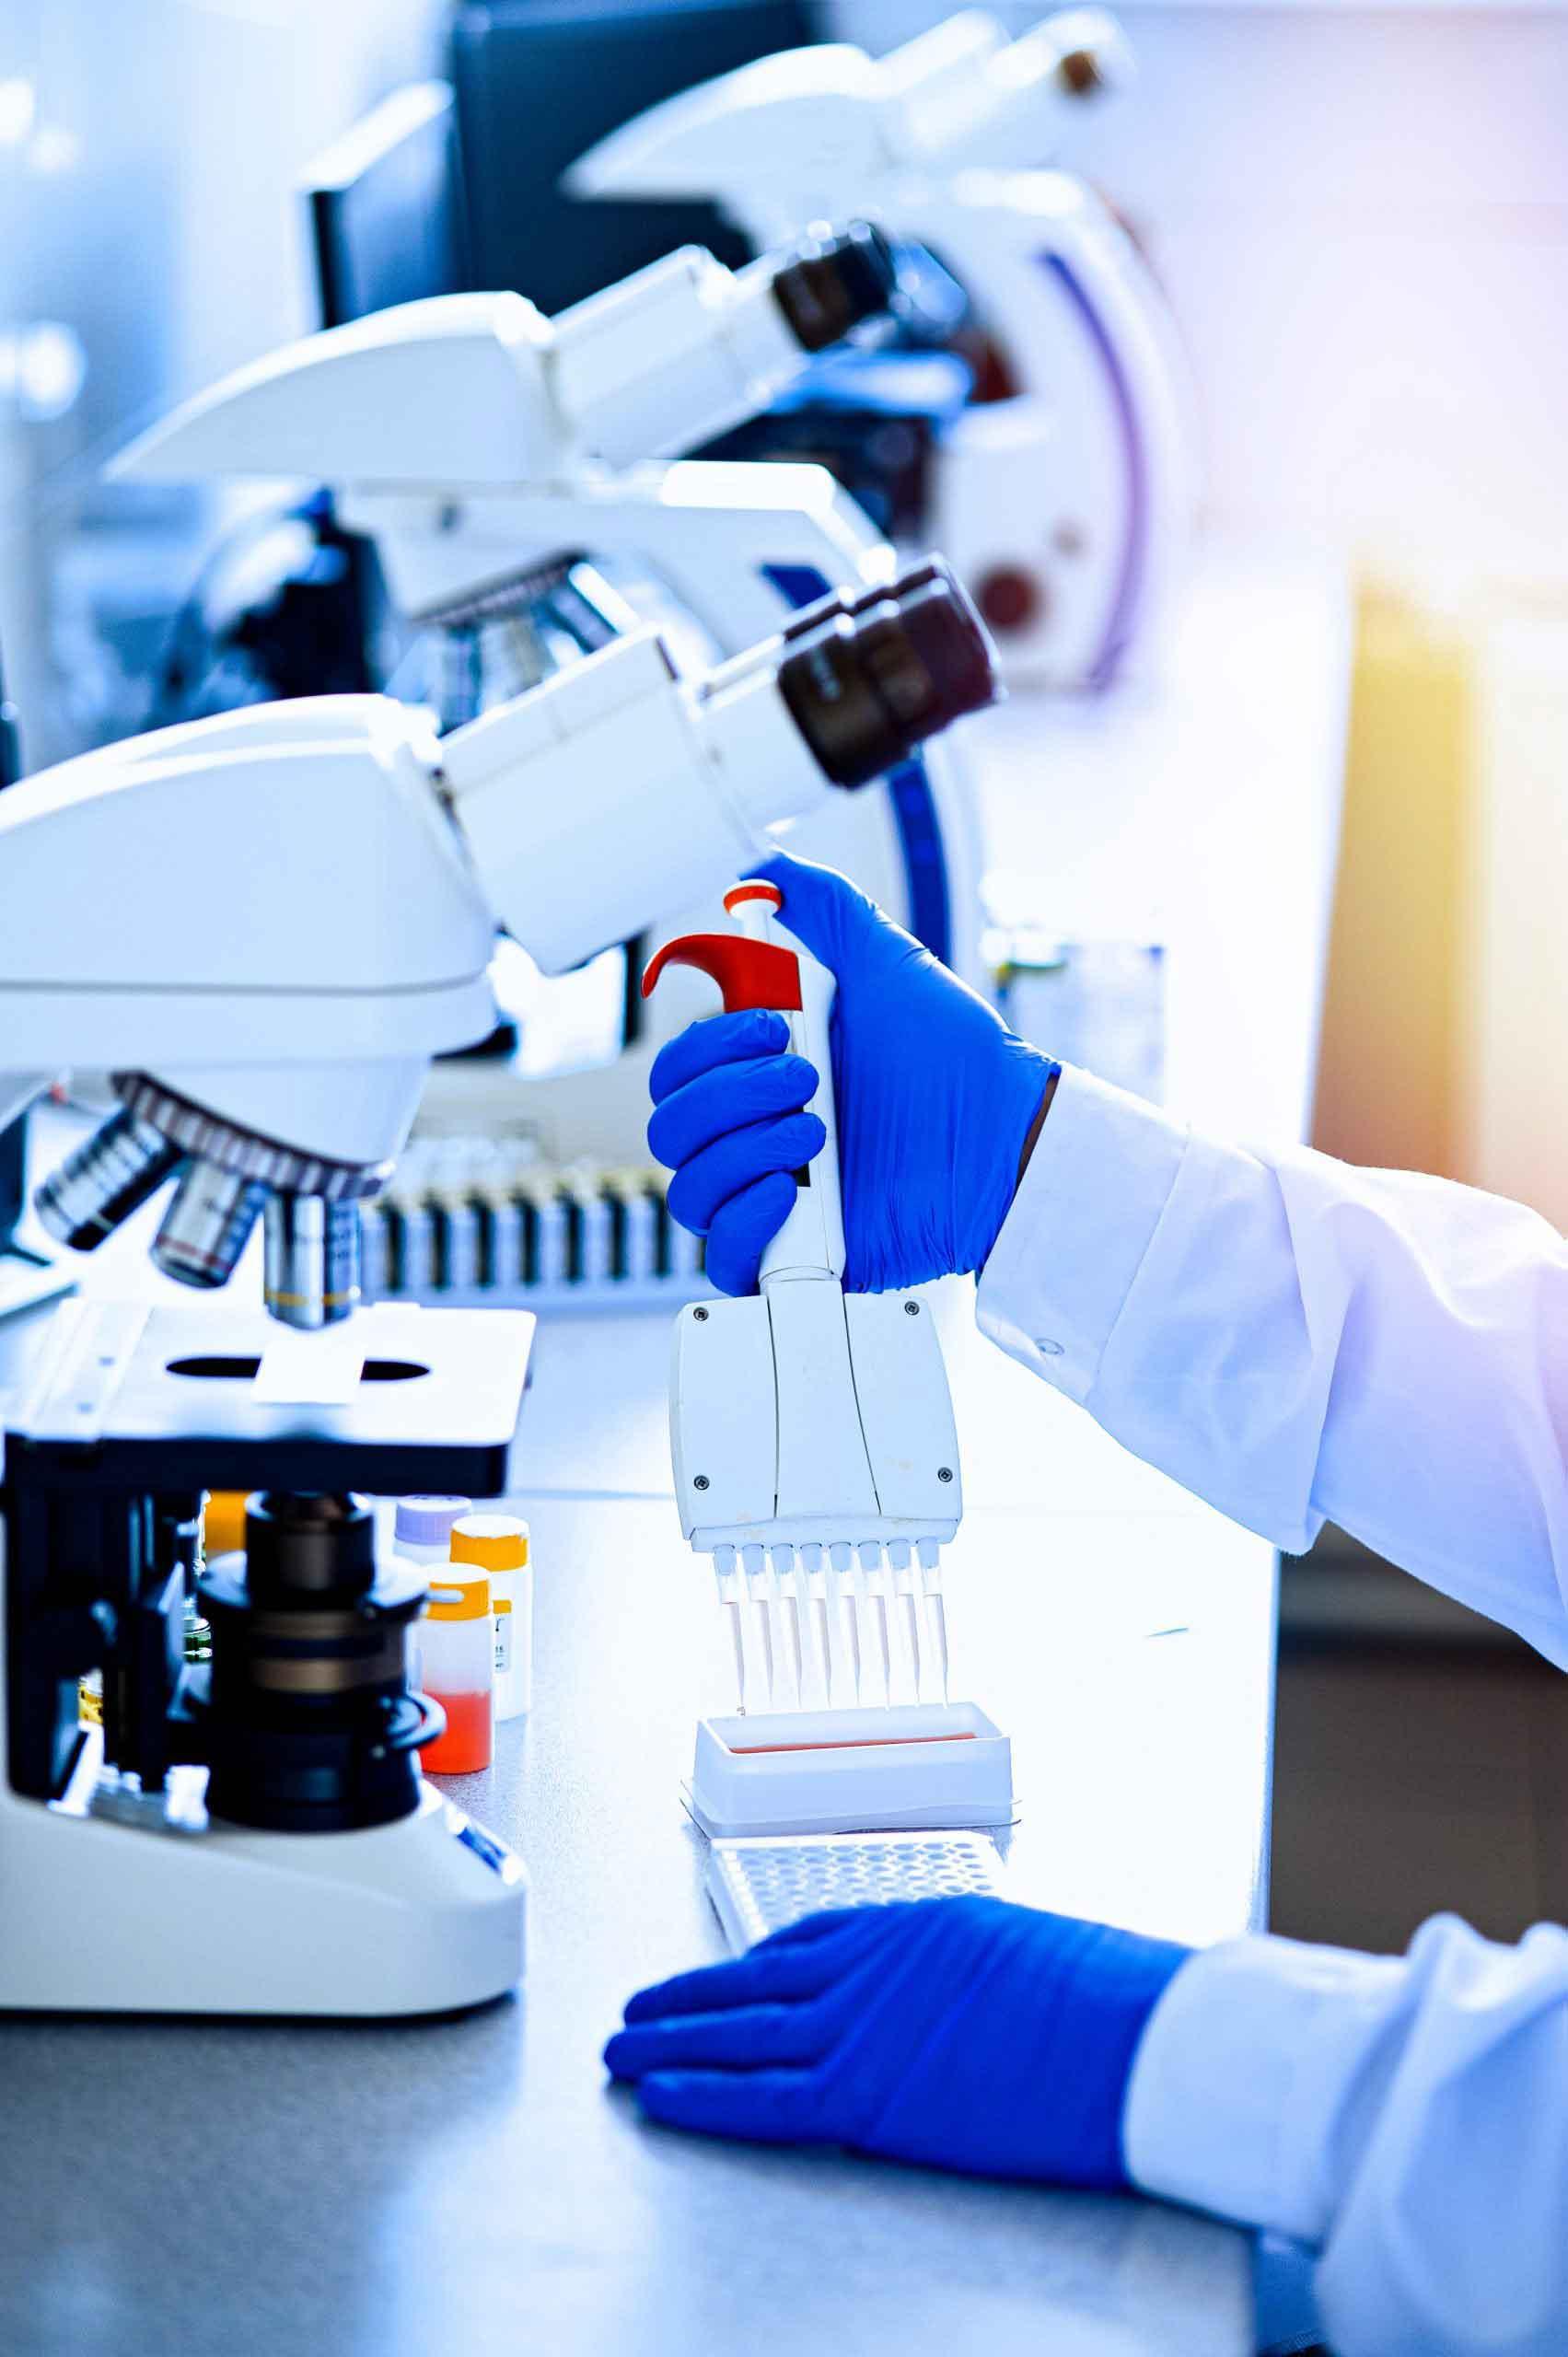 https://elarexinc.com/wp-content/uploads/2021/09/variable-volume-multichannel-pipette-medical-worker-scientist-laboratory-assistant-rubber-gloves-works-laboratory-scaled-1.jpg